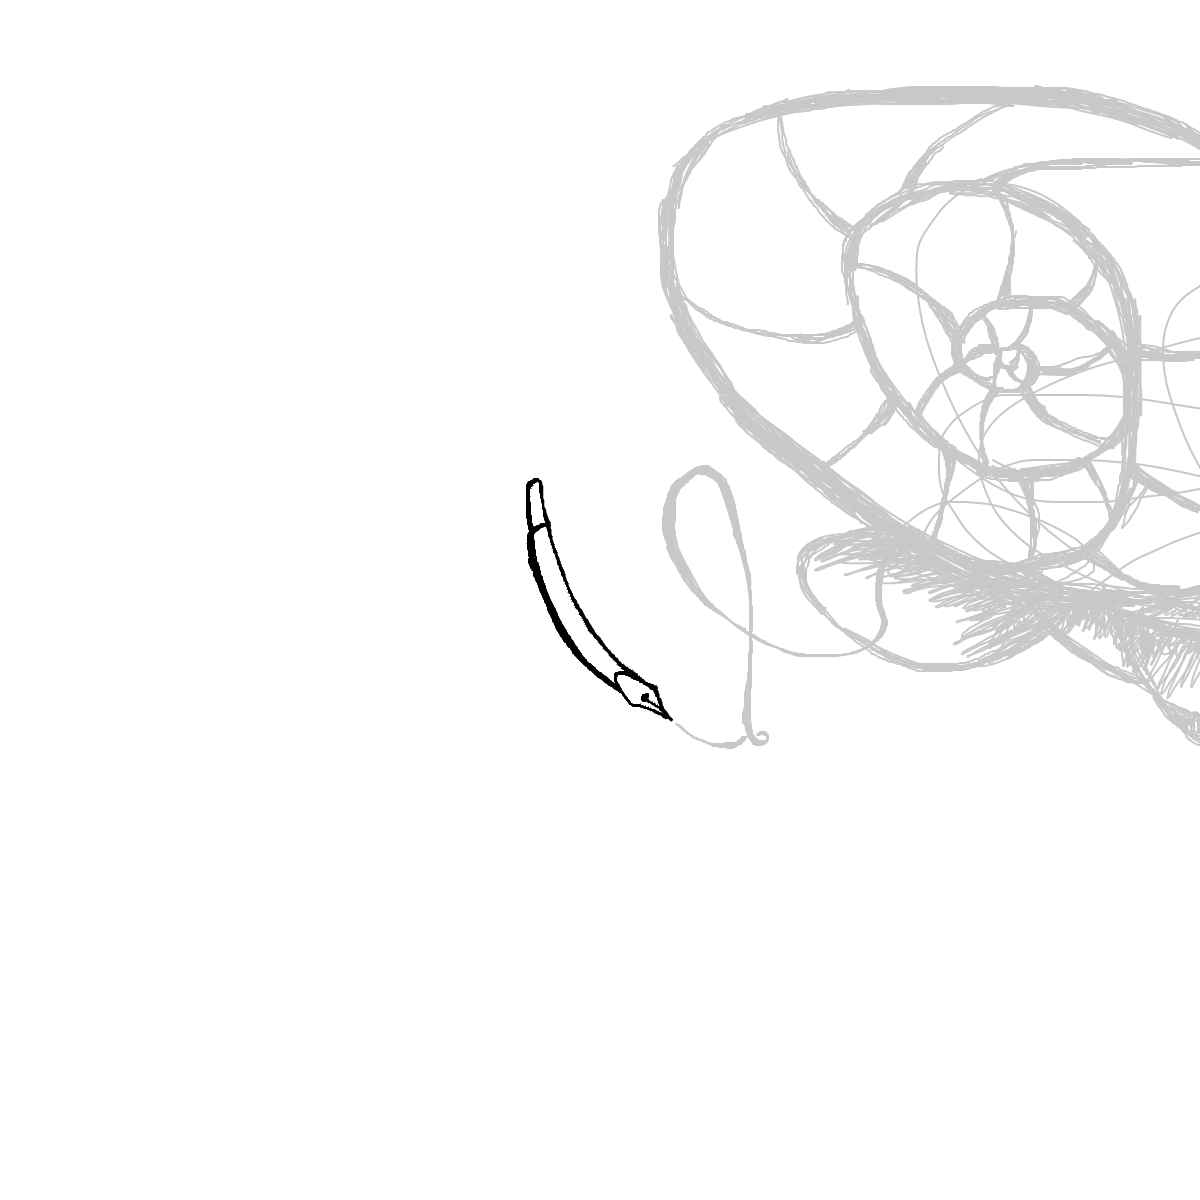 BAAAM drawing#7307 lat:42.8566627502441400lng: -2.7167153358459473